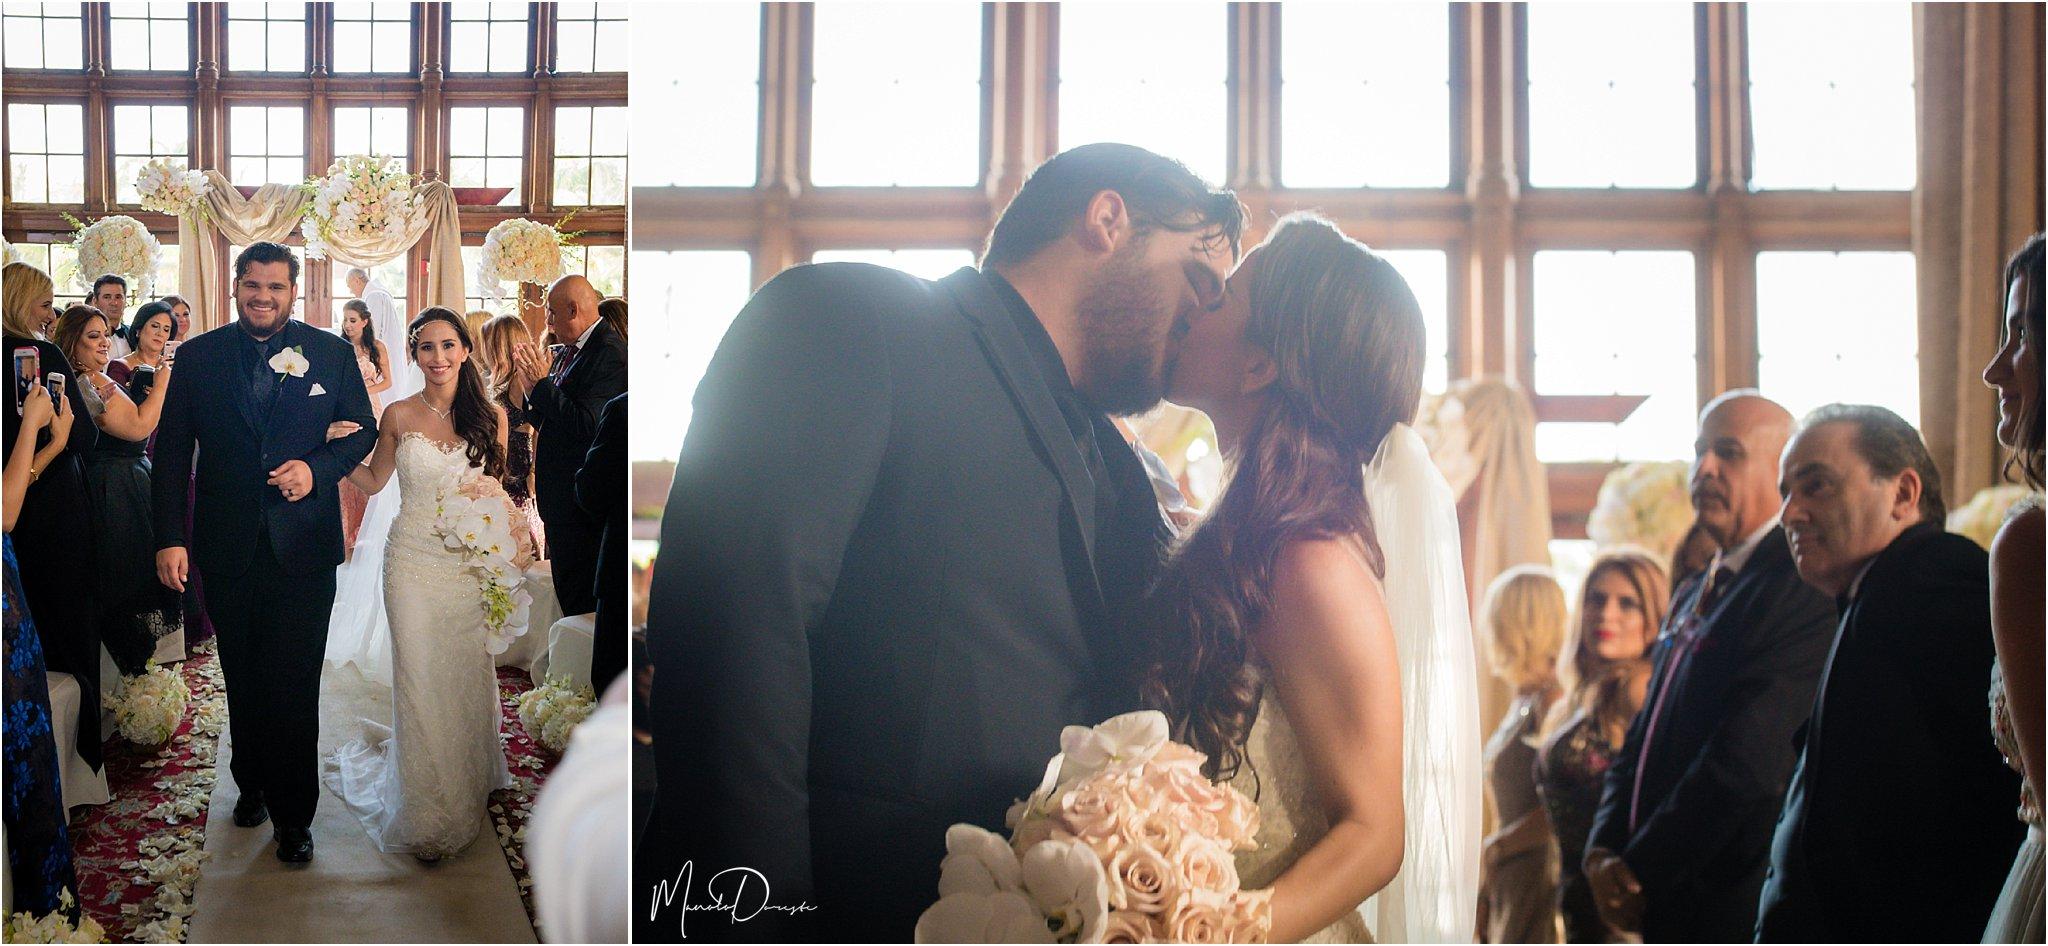 0166_ManoloDoreste_InFocusStudios_Wedding_Family_Photography_Miami_MiamiPhotographer.jpg